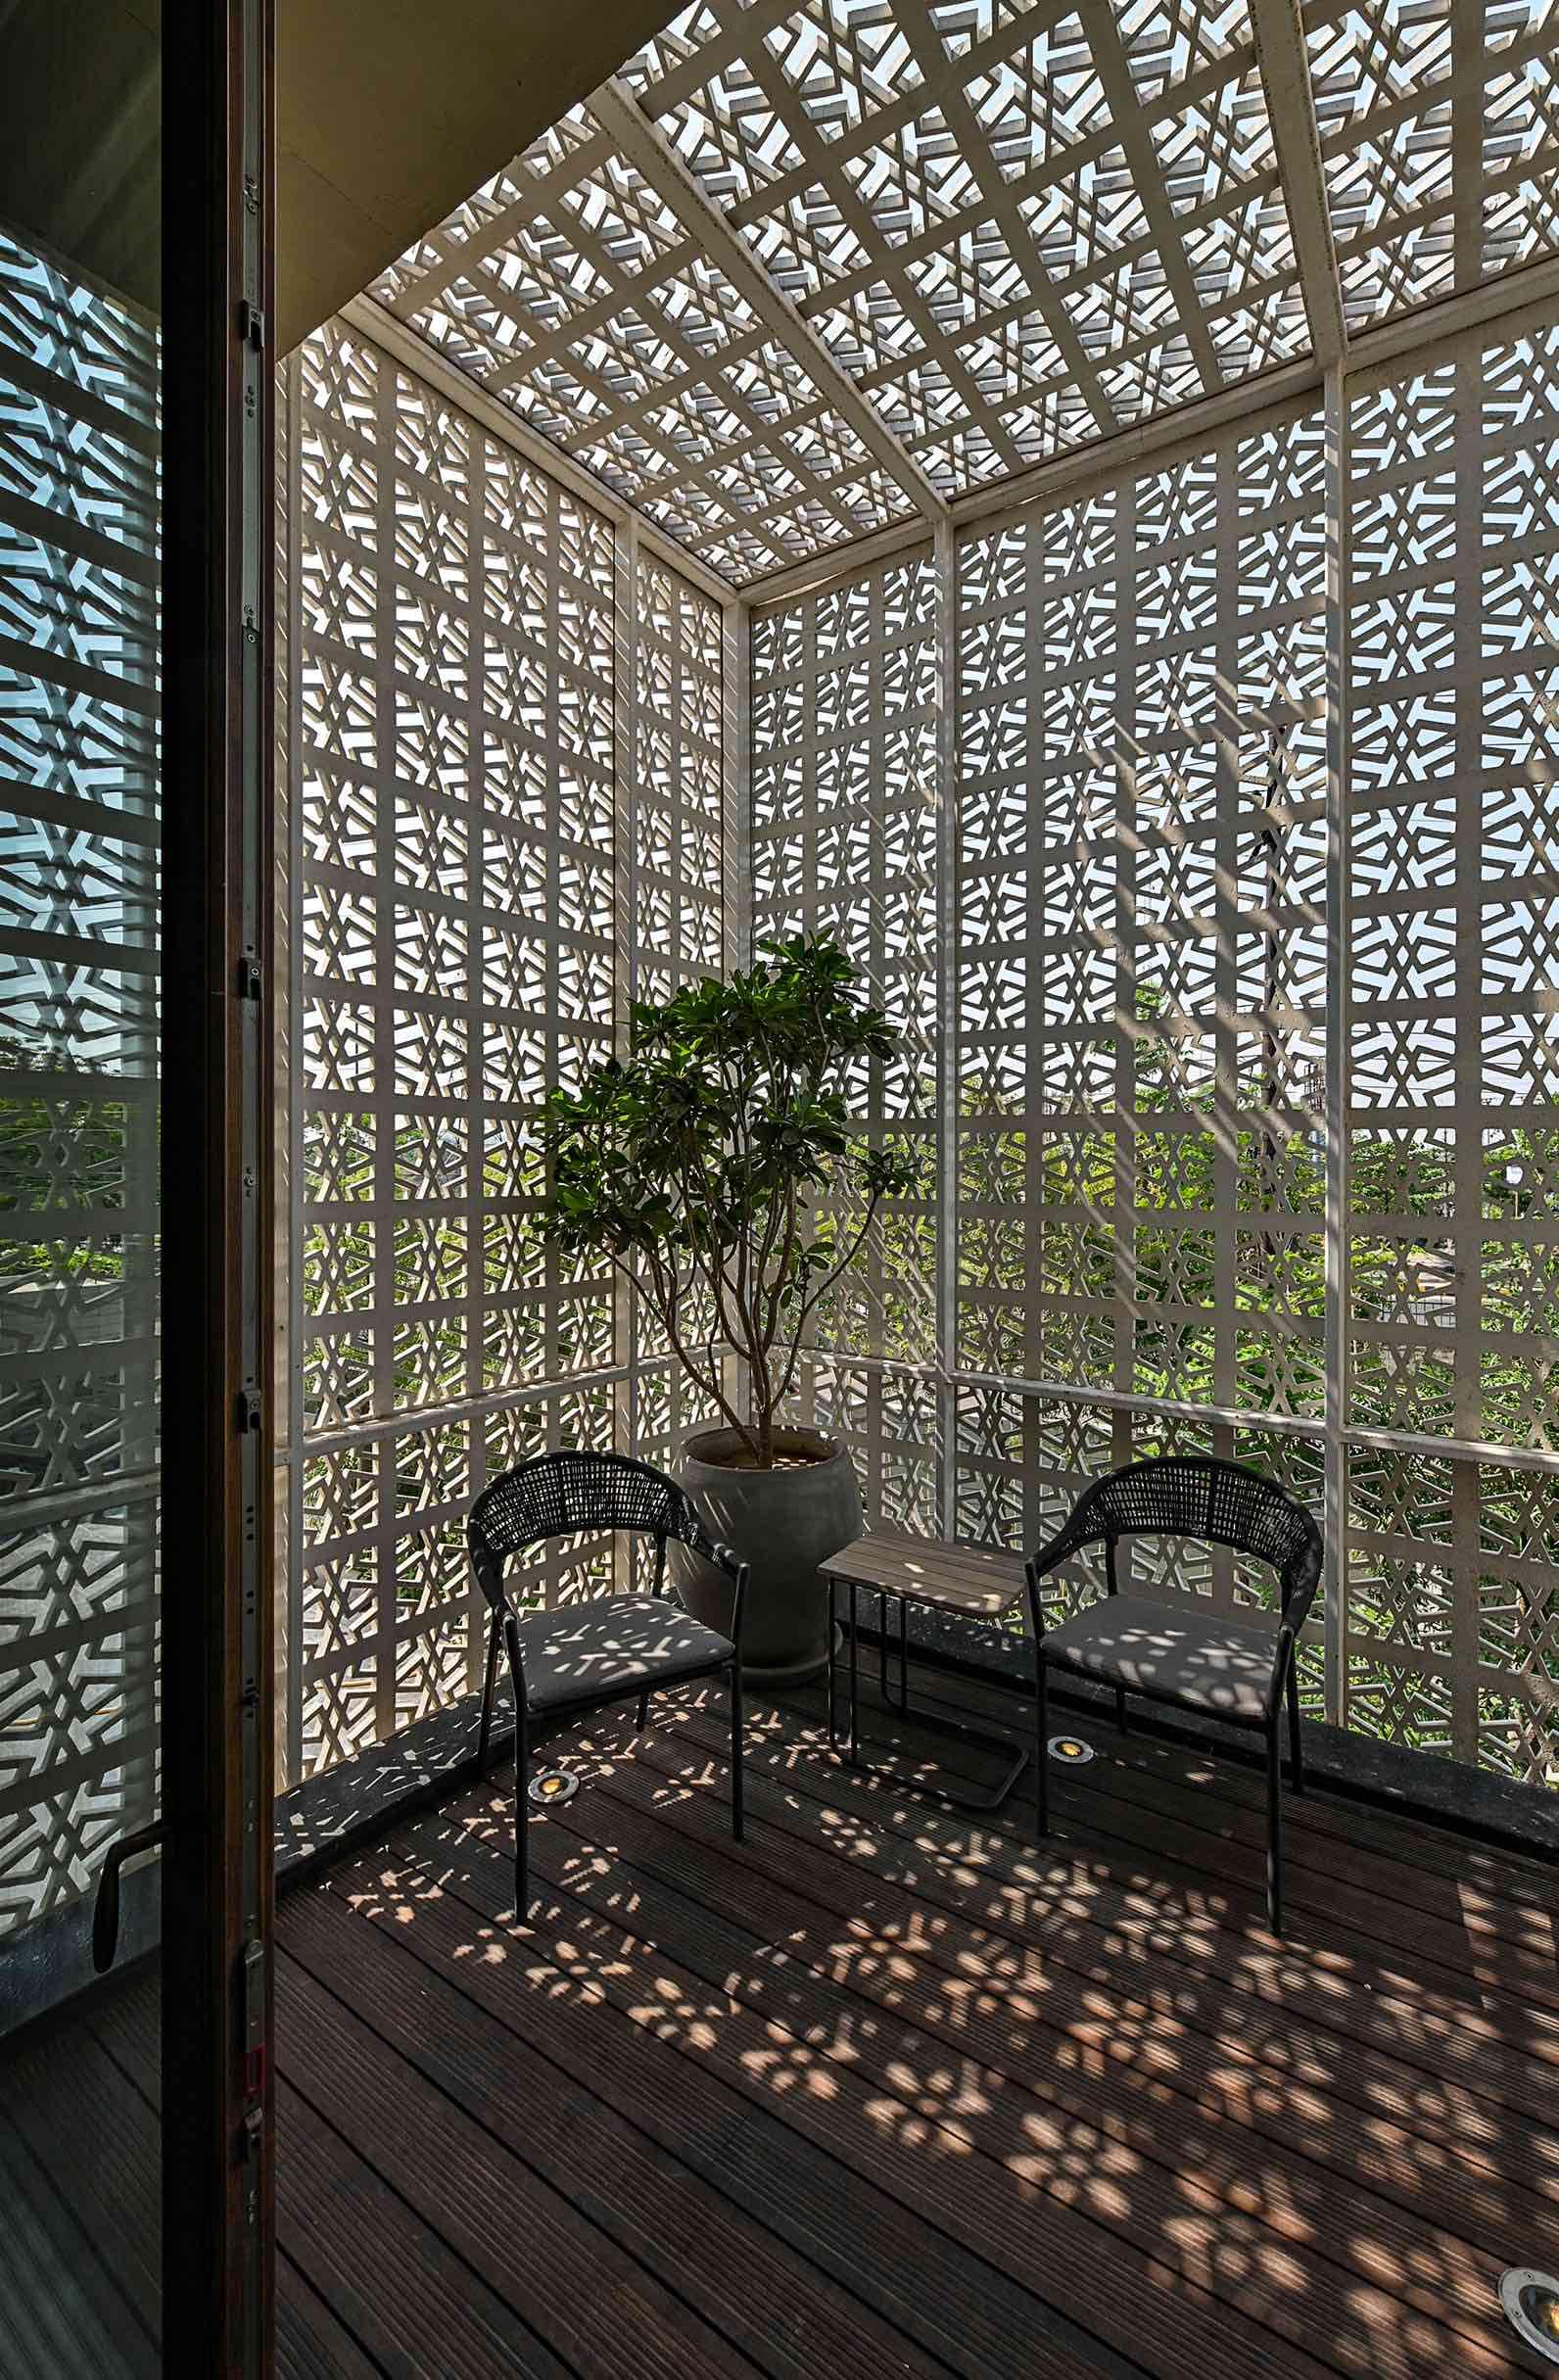 18_Screens_Sanjay_Puri_architects_india_amazingarchitecture_010.jpg